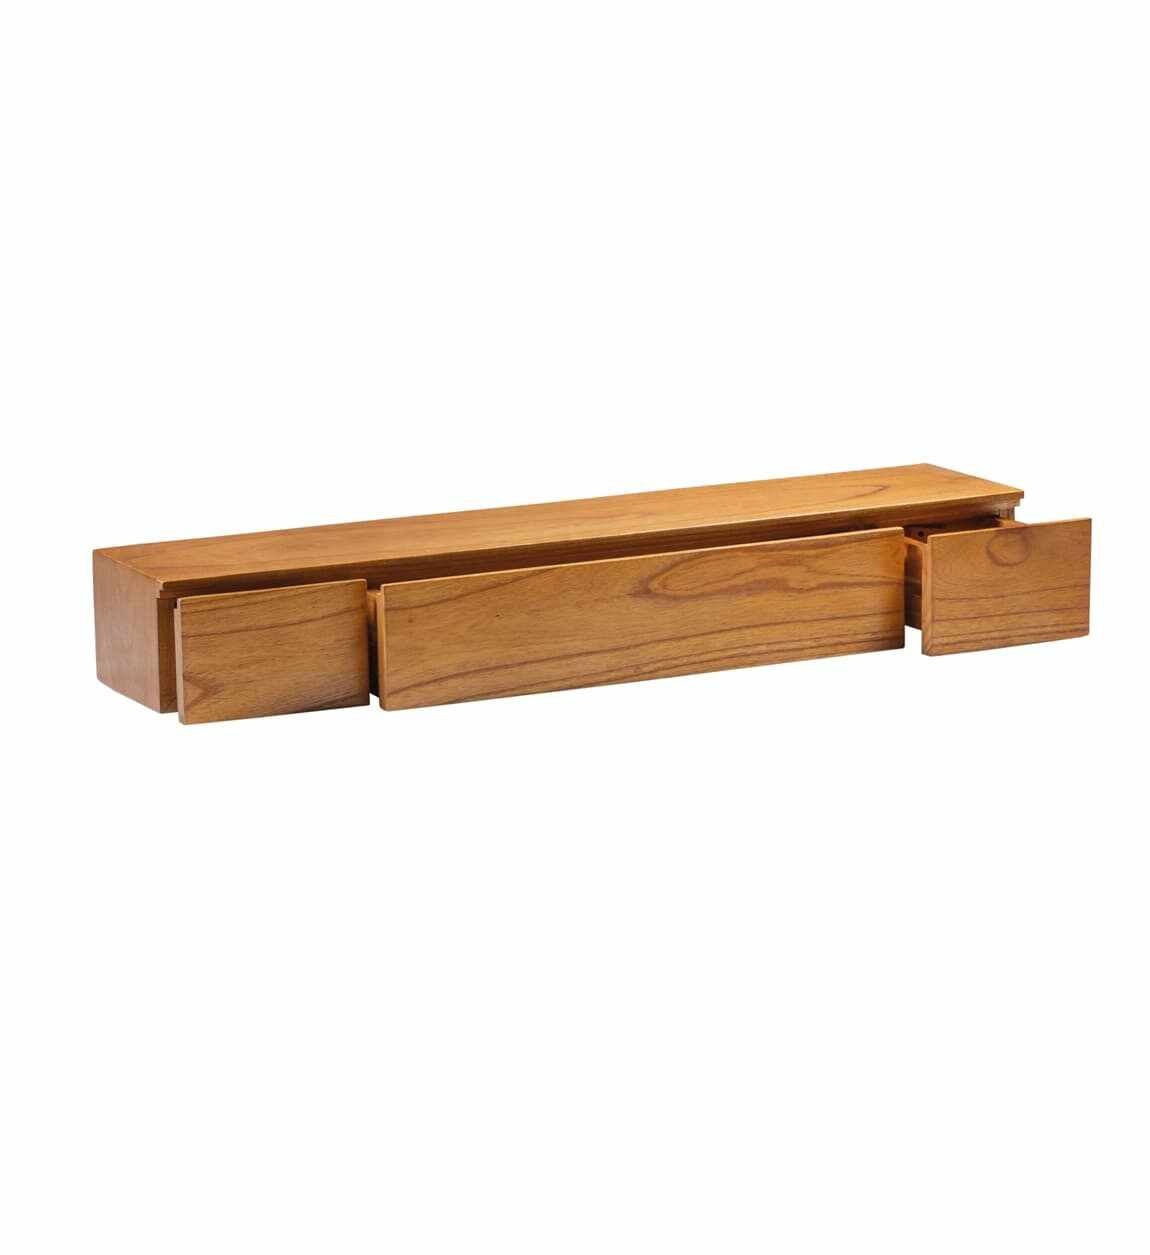 Etajera suspendata din lemn cu 3 sertare, Madhu Natural, l100xA20xH14 cm la pret 600 lei